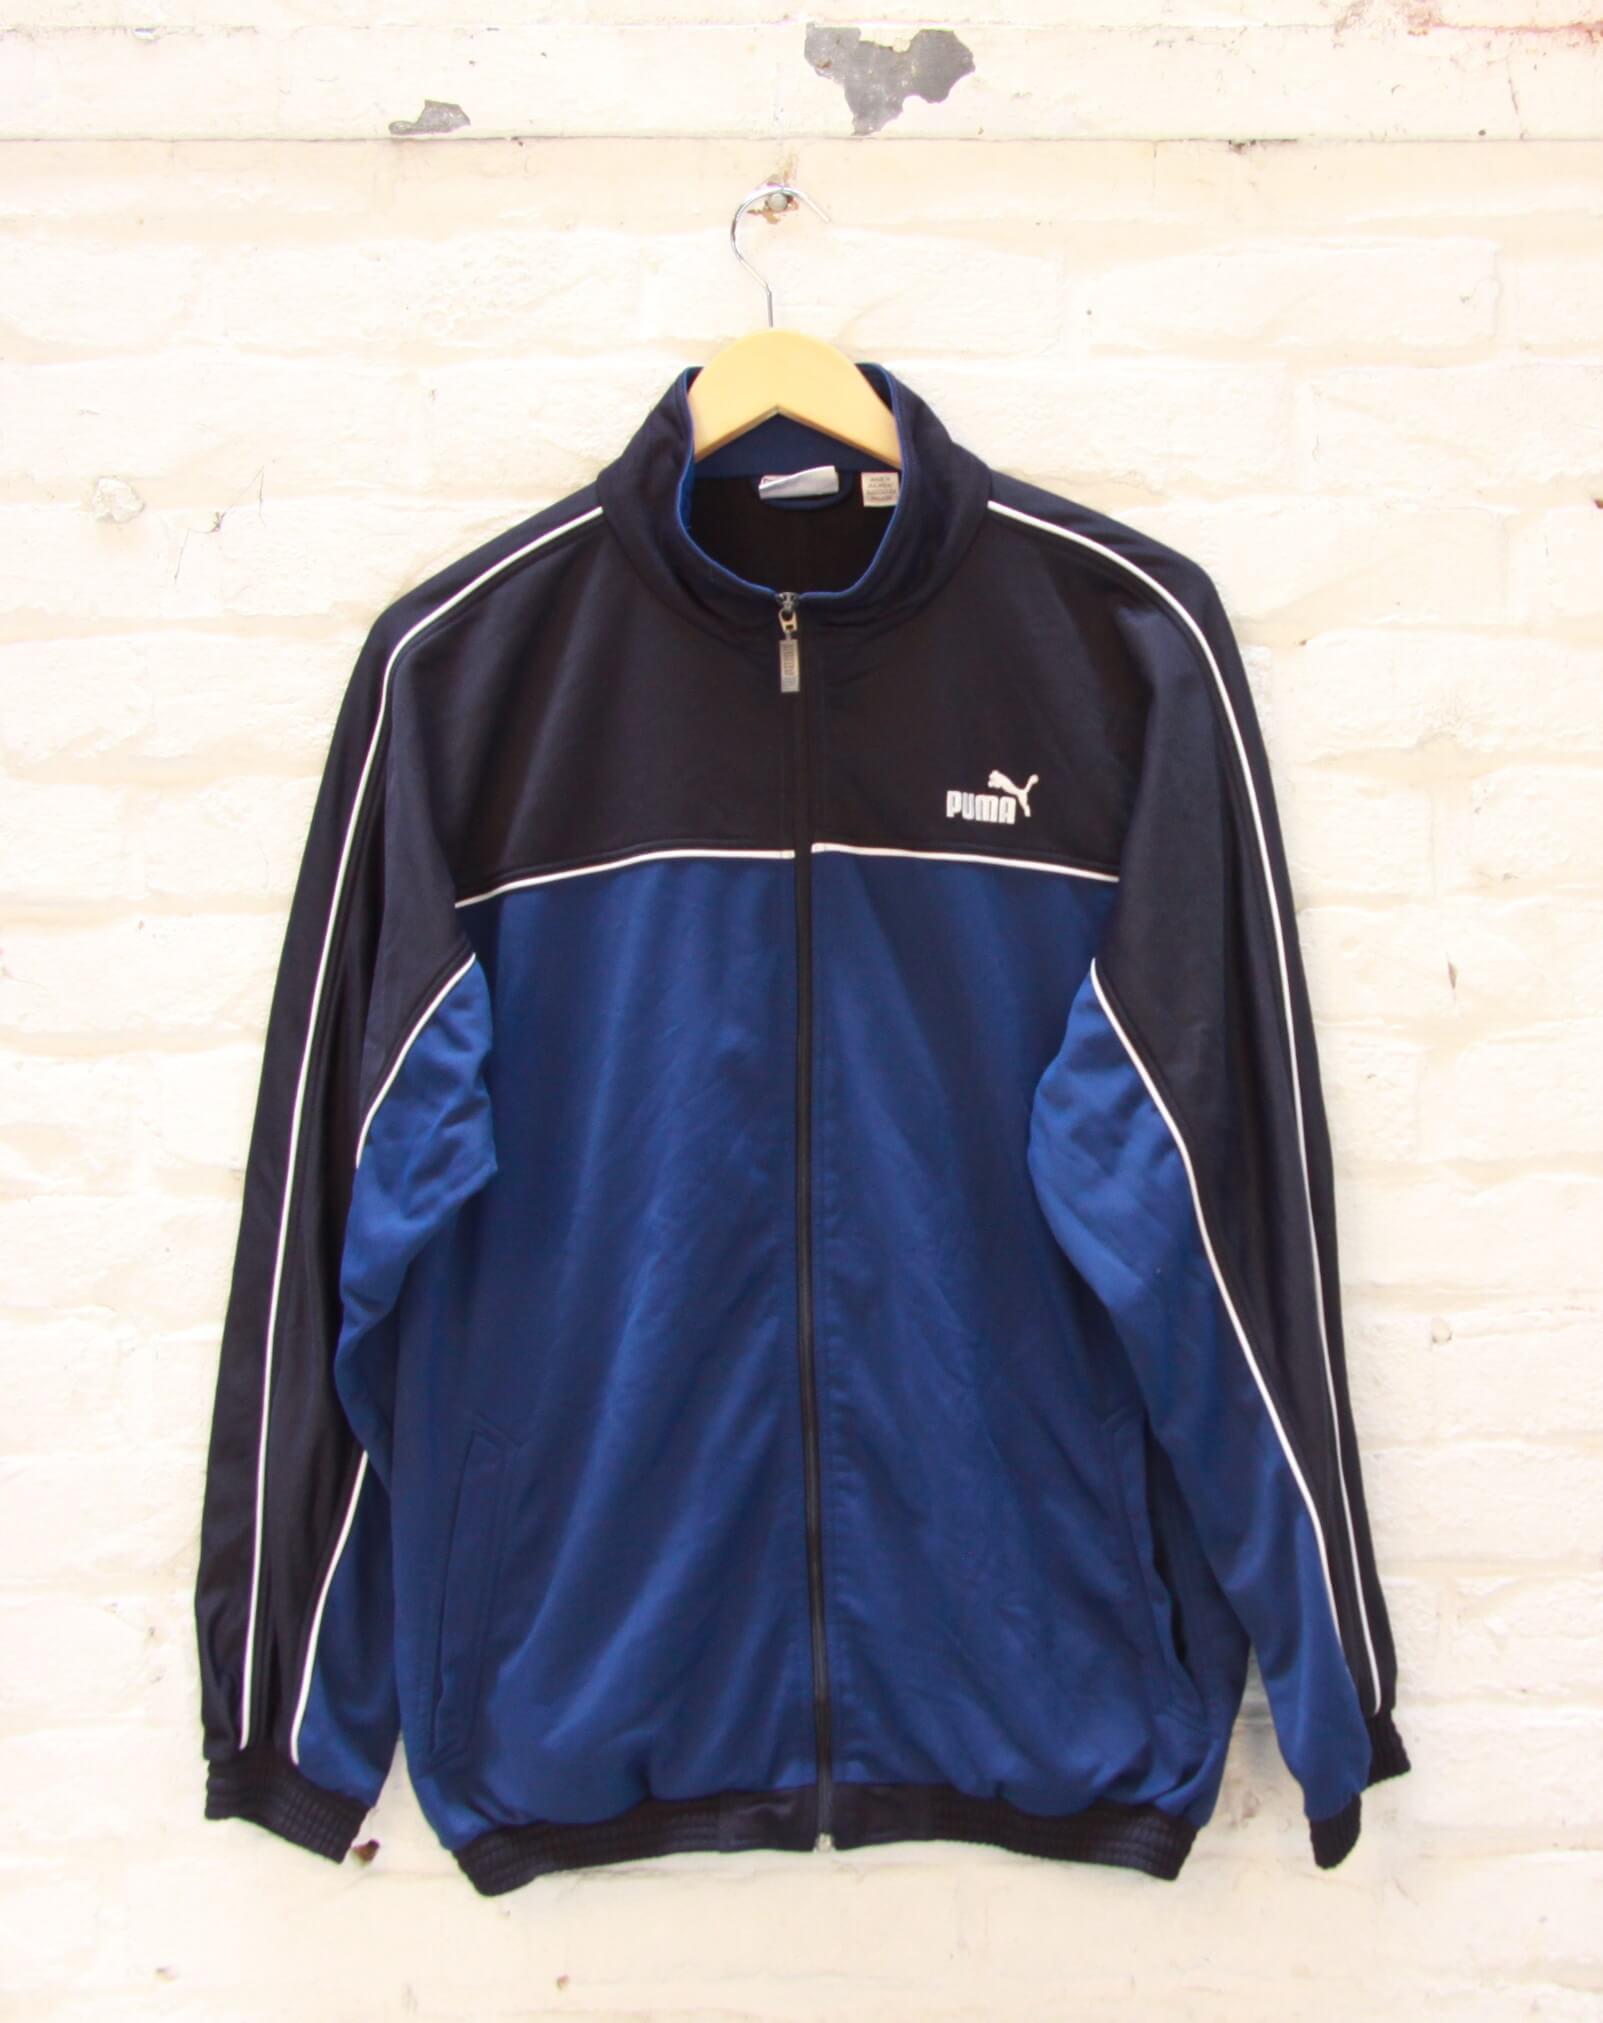 Veste de Jogging - Puma - Vintage - Bleu Marine - Noir - Tilt Vintage 2cfe2225145